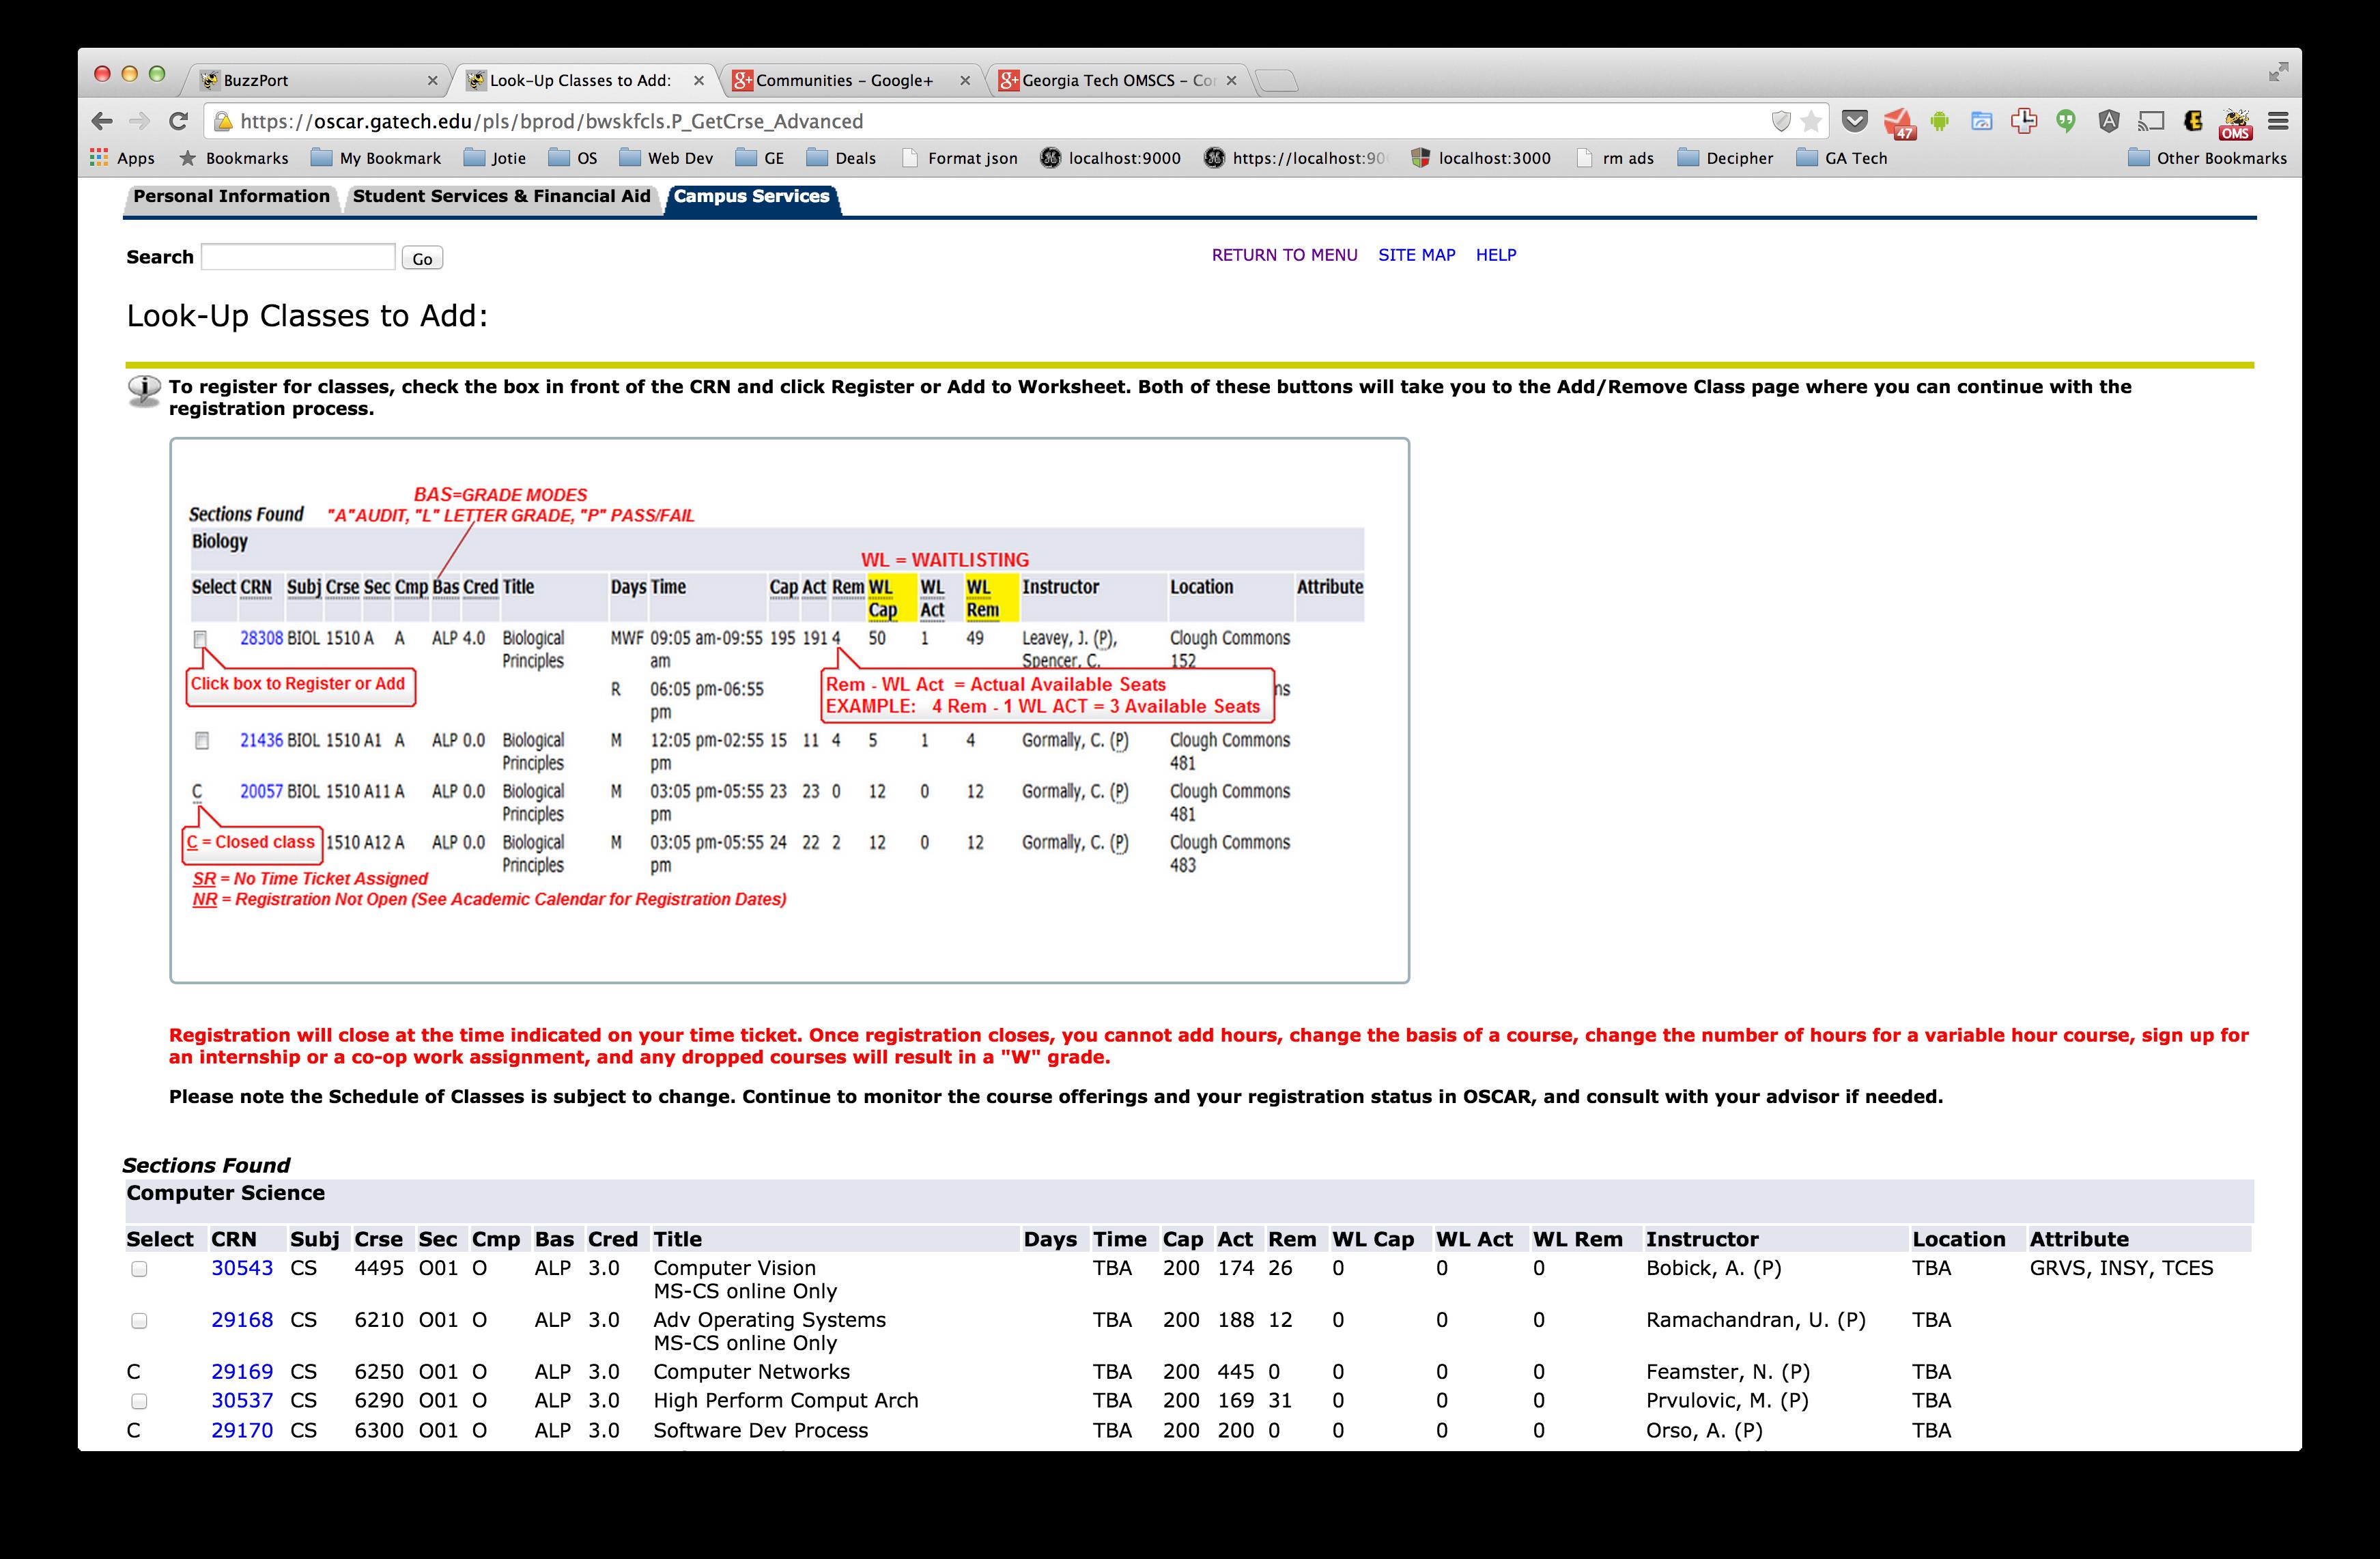 GitHub - jotielim/gatechomscsclass: Chrome extension to